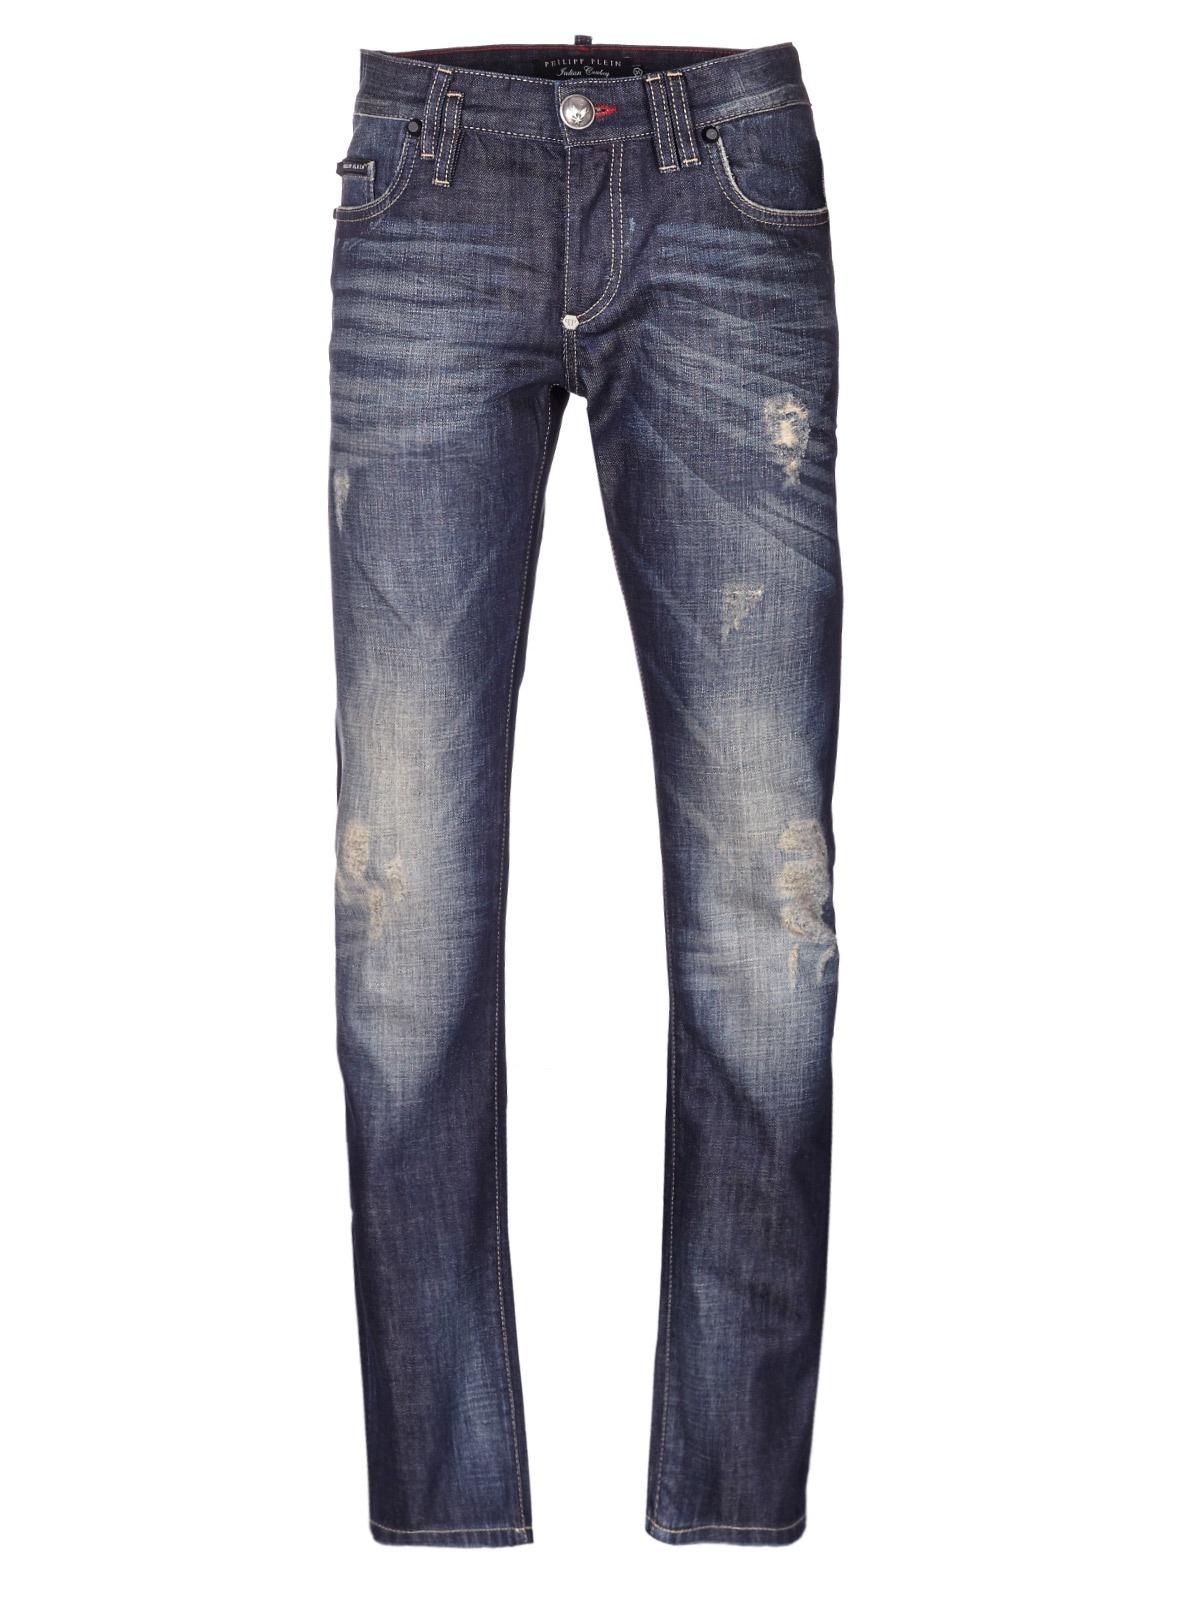 philipp plein jeans in blue for men lyst. Black Bedroom Furniture Sets. Home Design Ideas